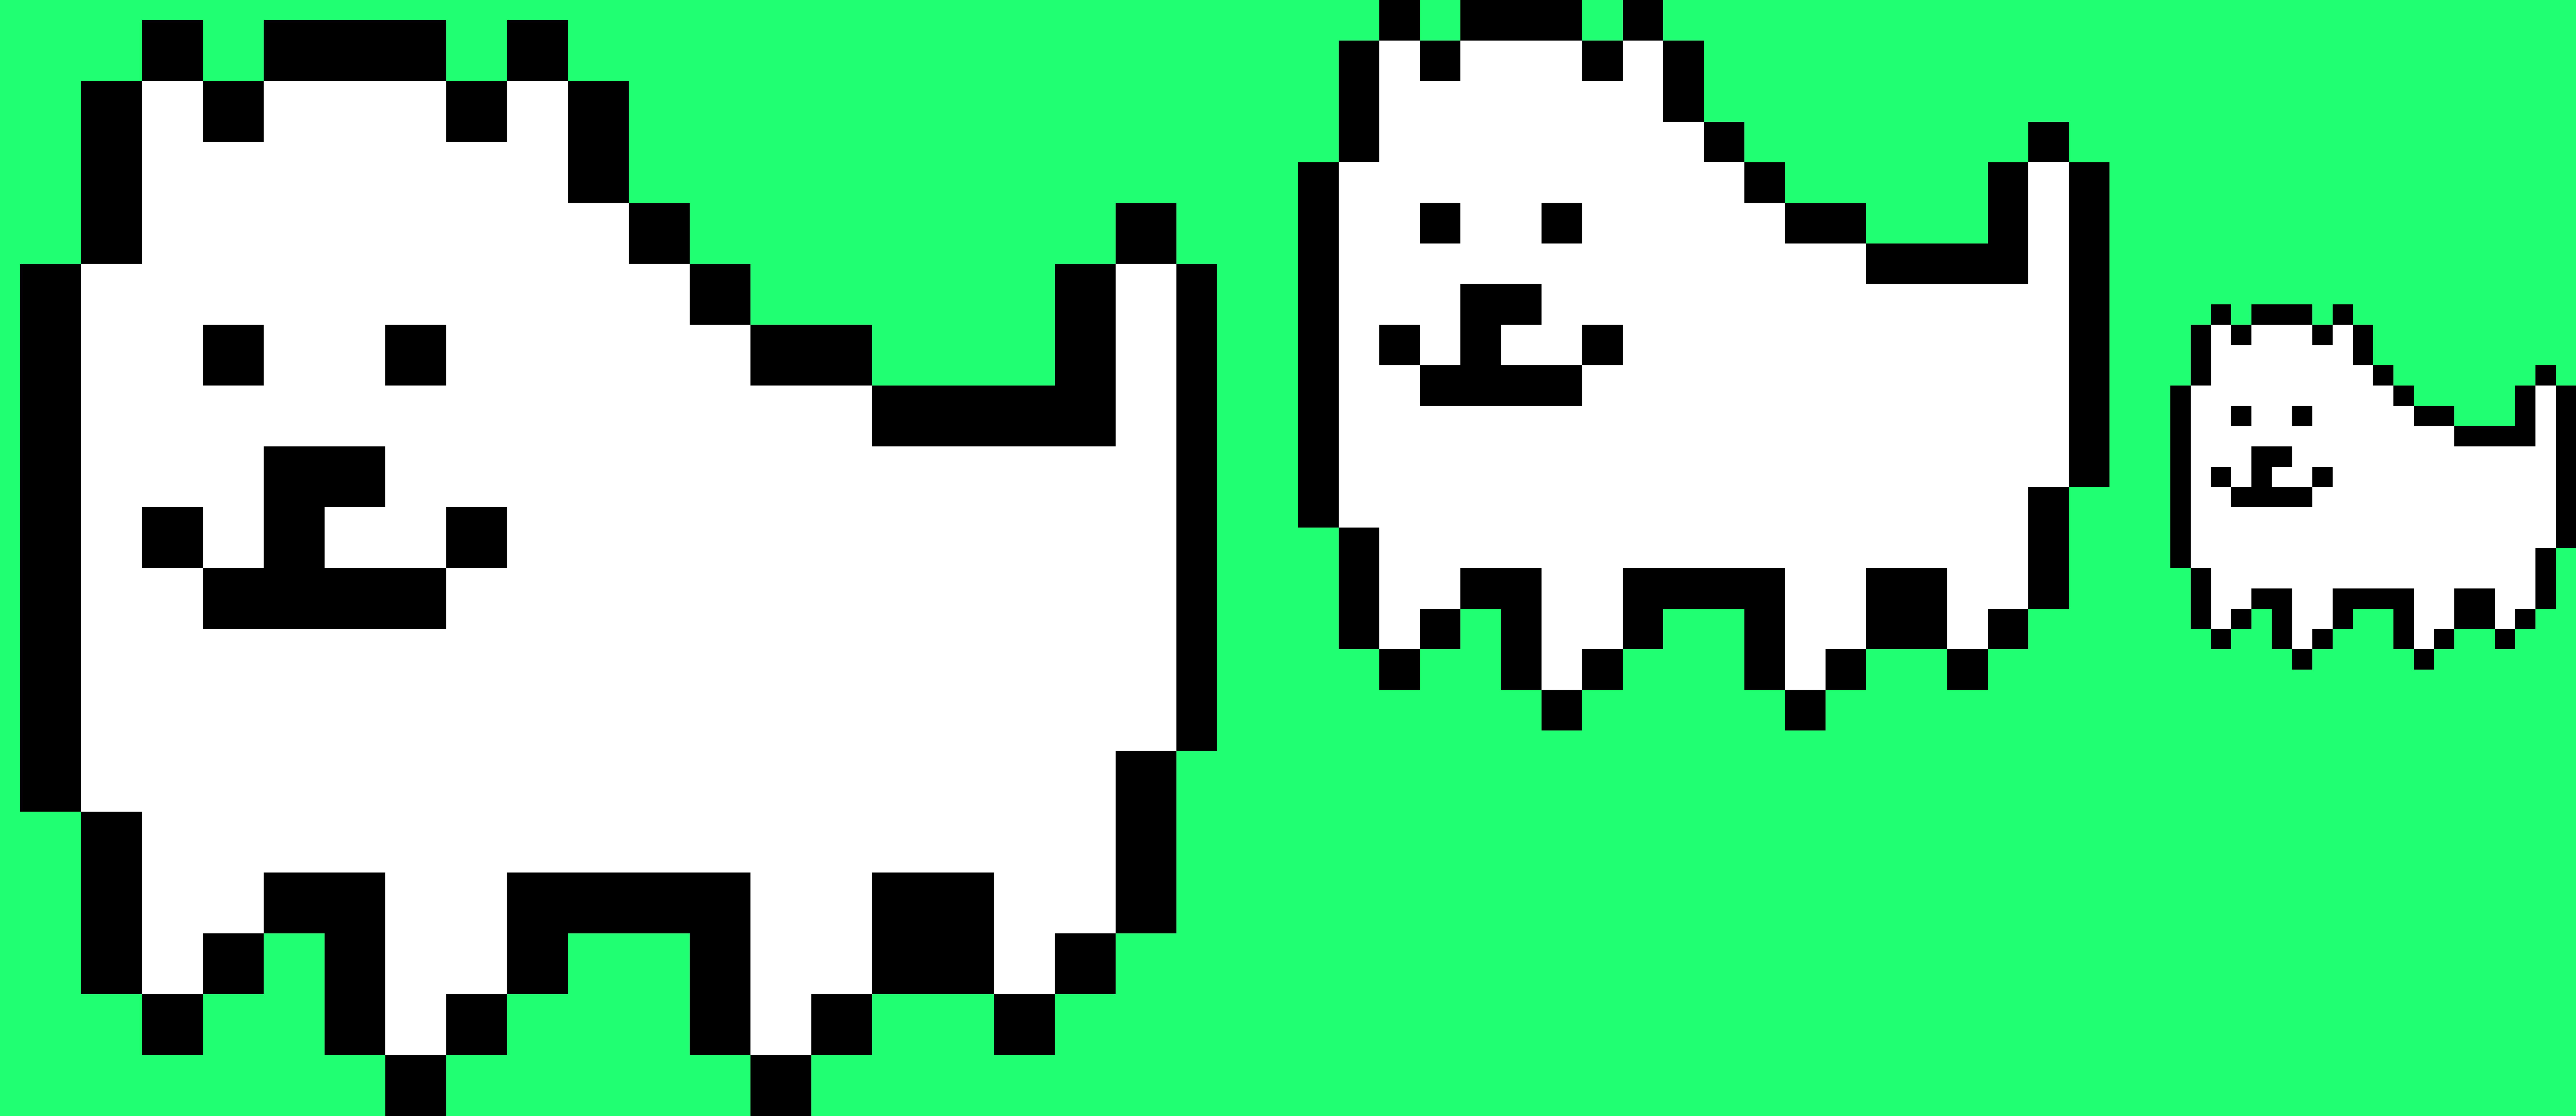 Annoying dogs 1.